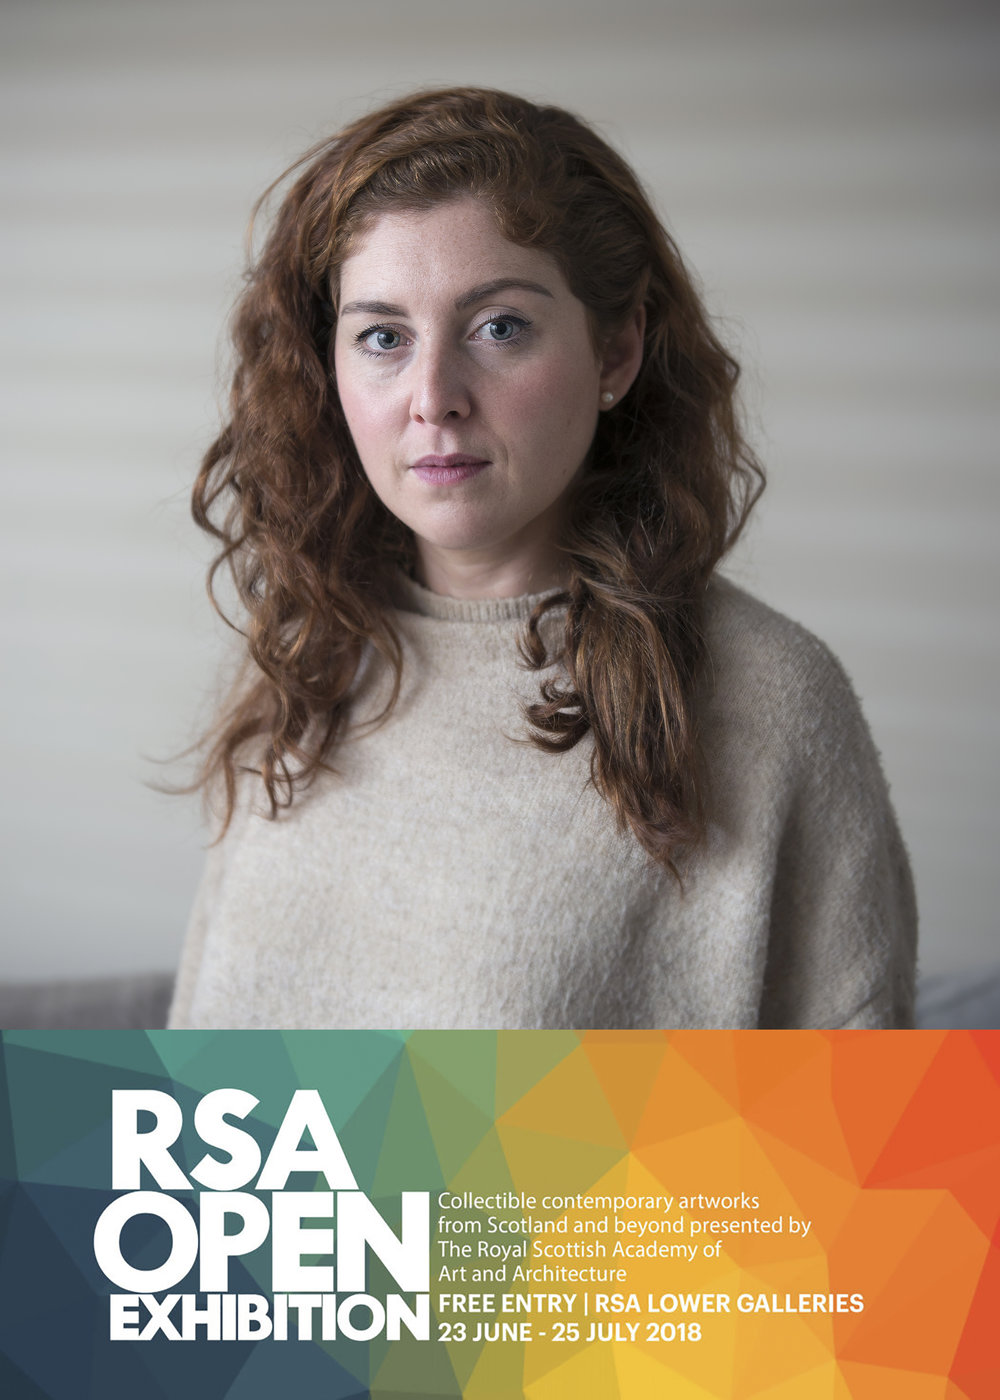 RSA Open exhibition 2018